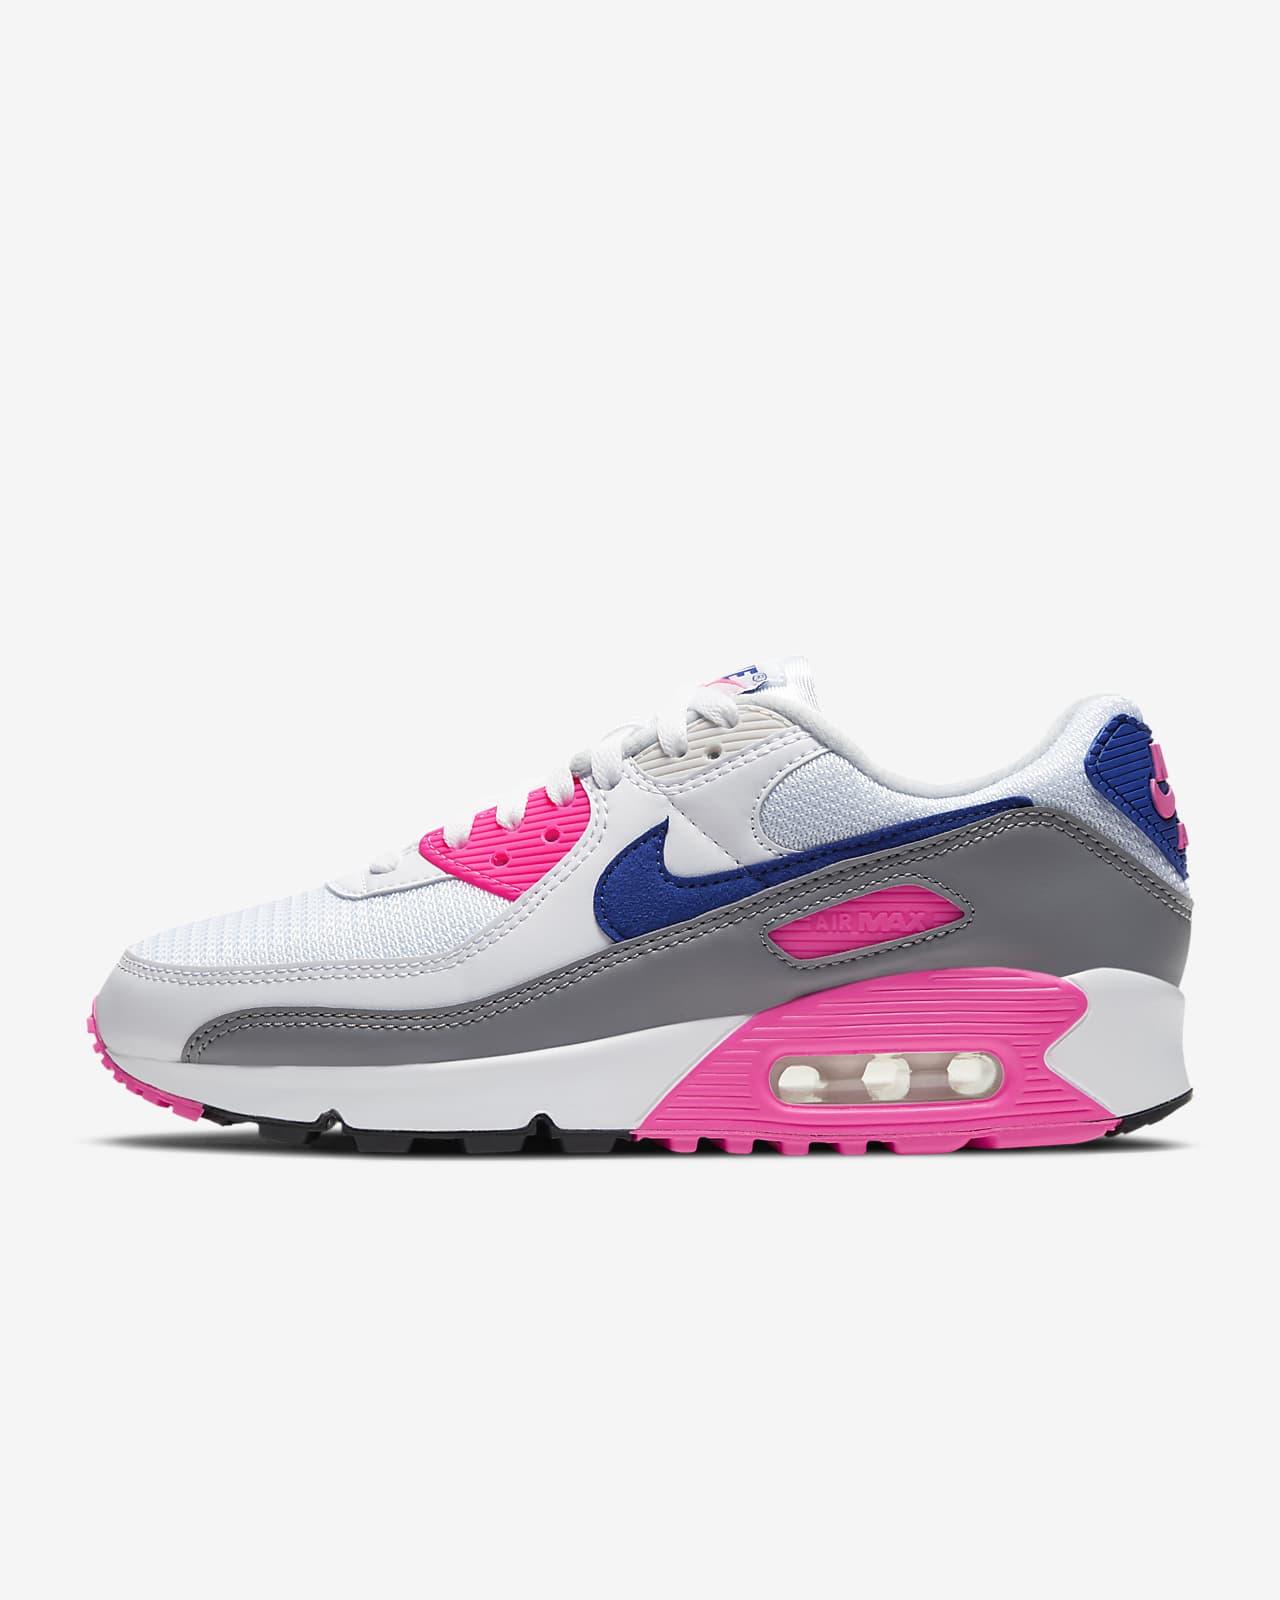 nike women's air max 27 shoes